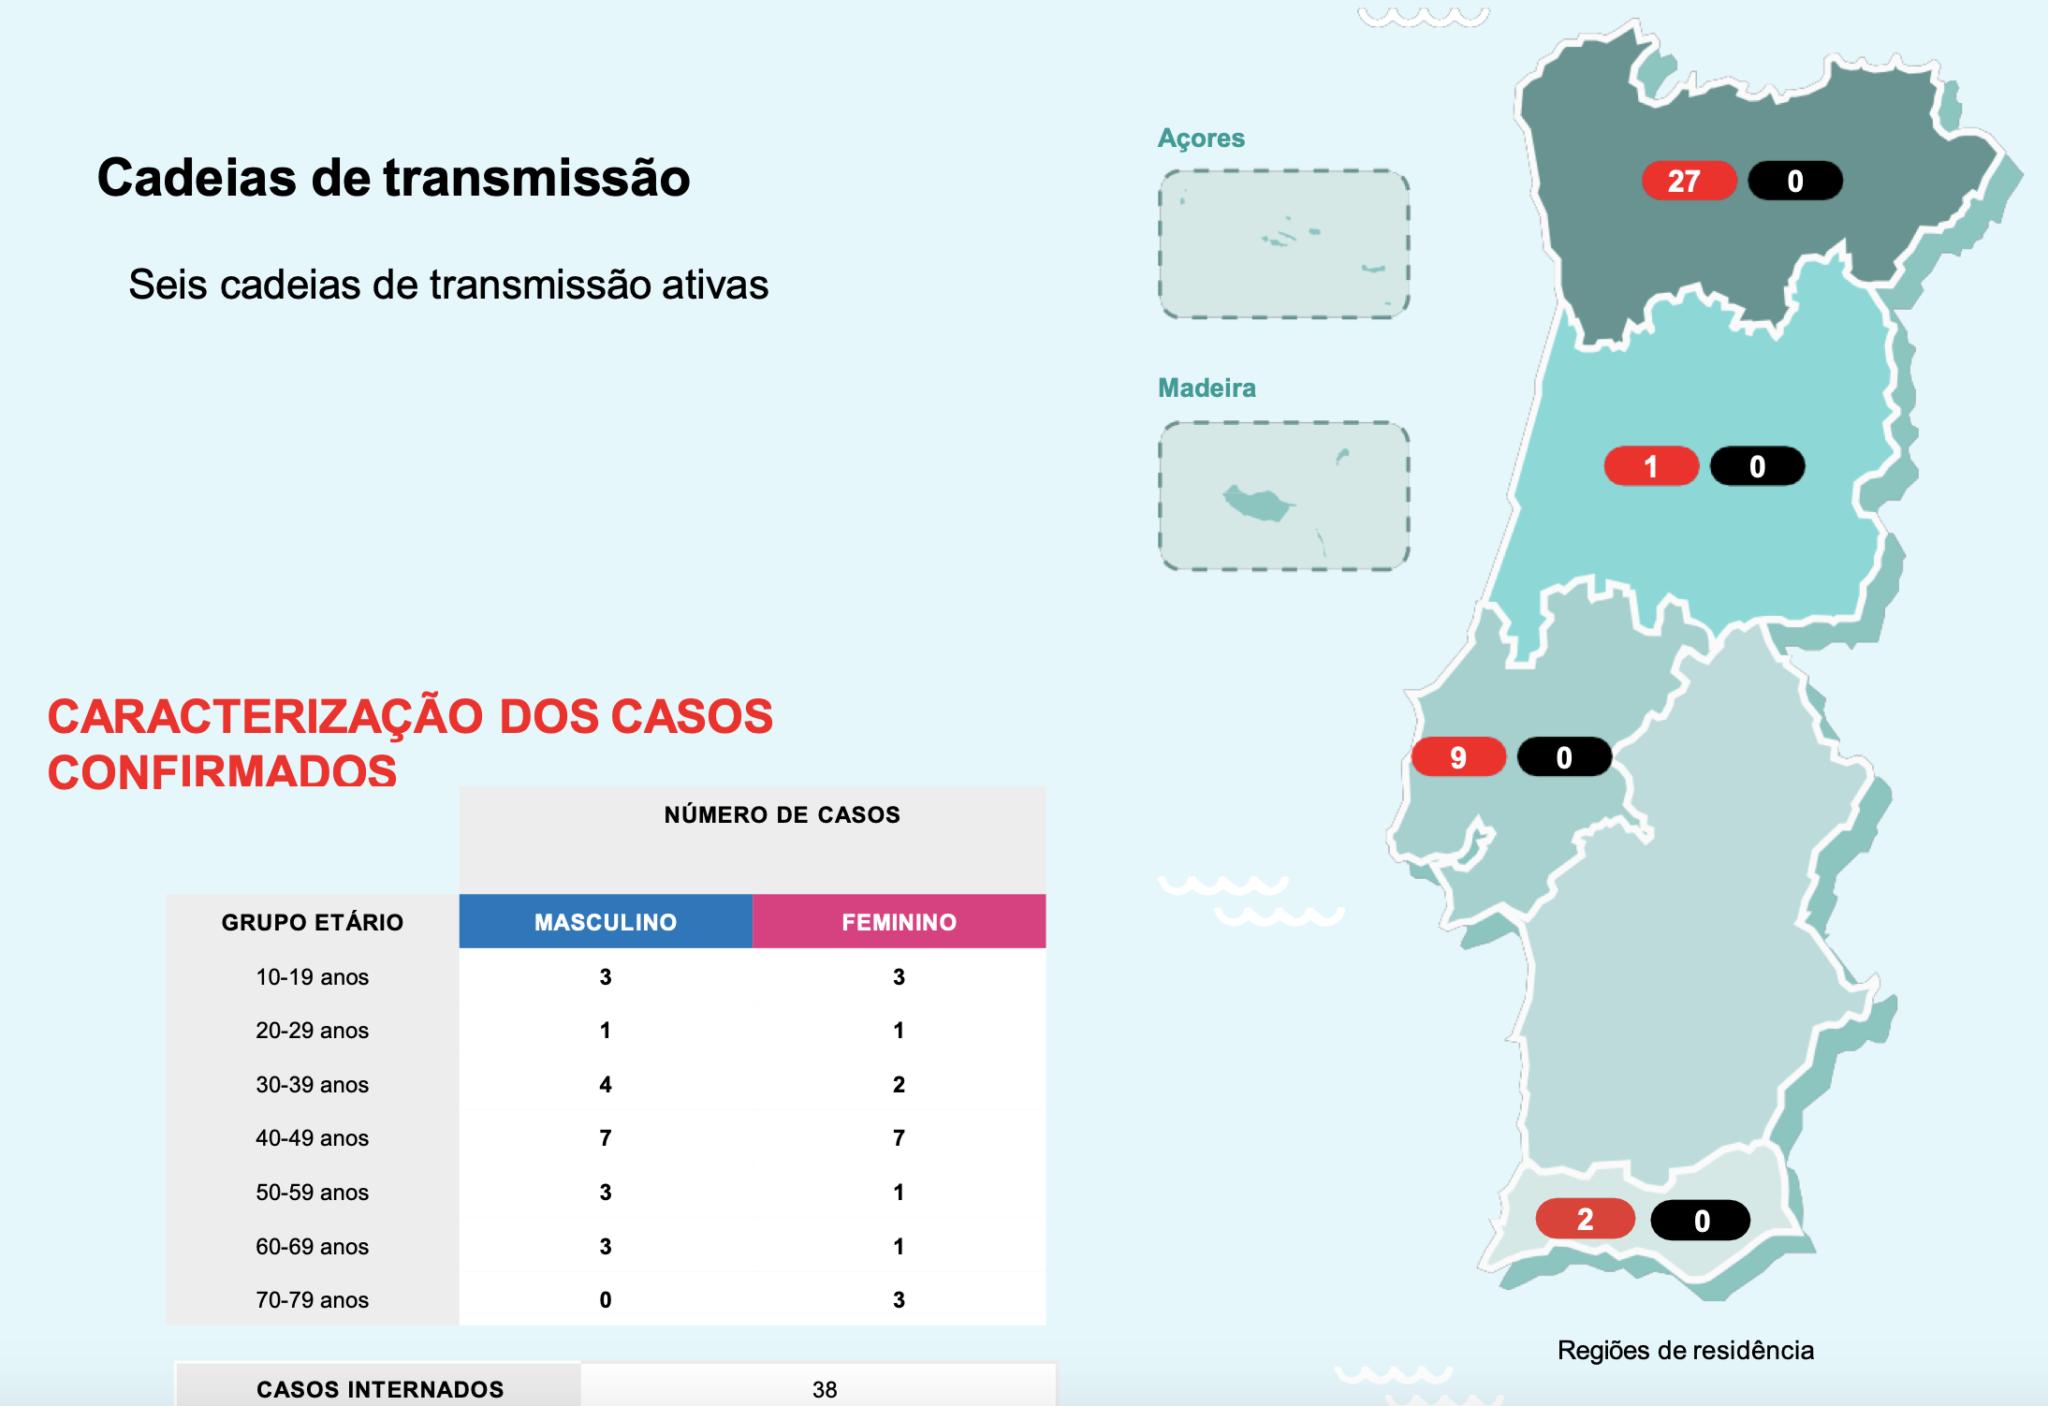 Koronawirus w Portugalii 2020 aktualna sytuacja Portugalia Lizbona Porto Madera Algarve